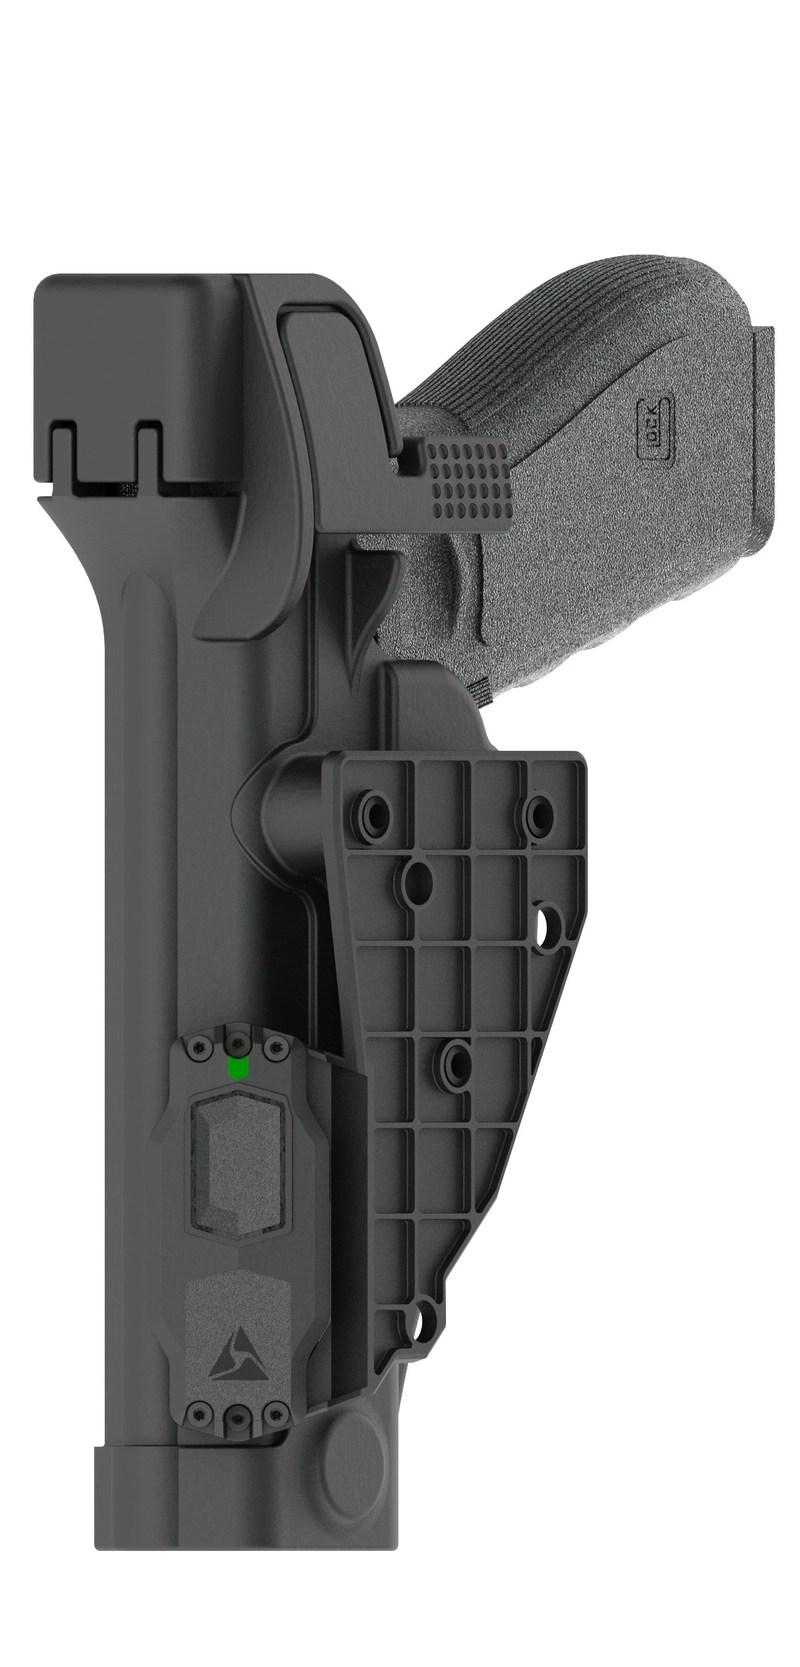 Axon Signal Sidearm by TASER International, Inc., Scottsdale, AZ, USA